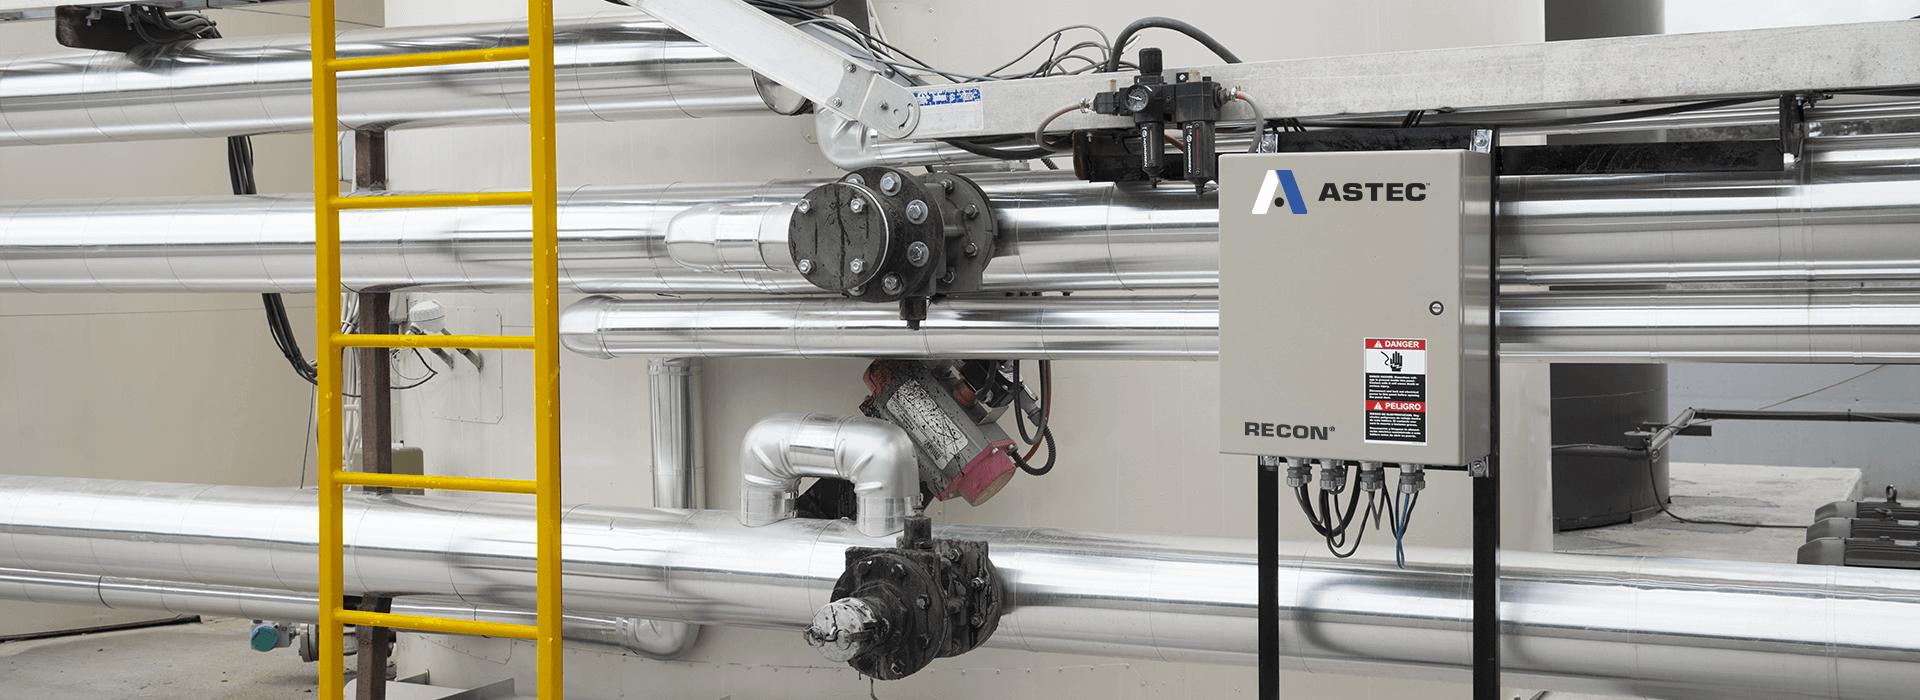 Heatec Recon Monitoring System